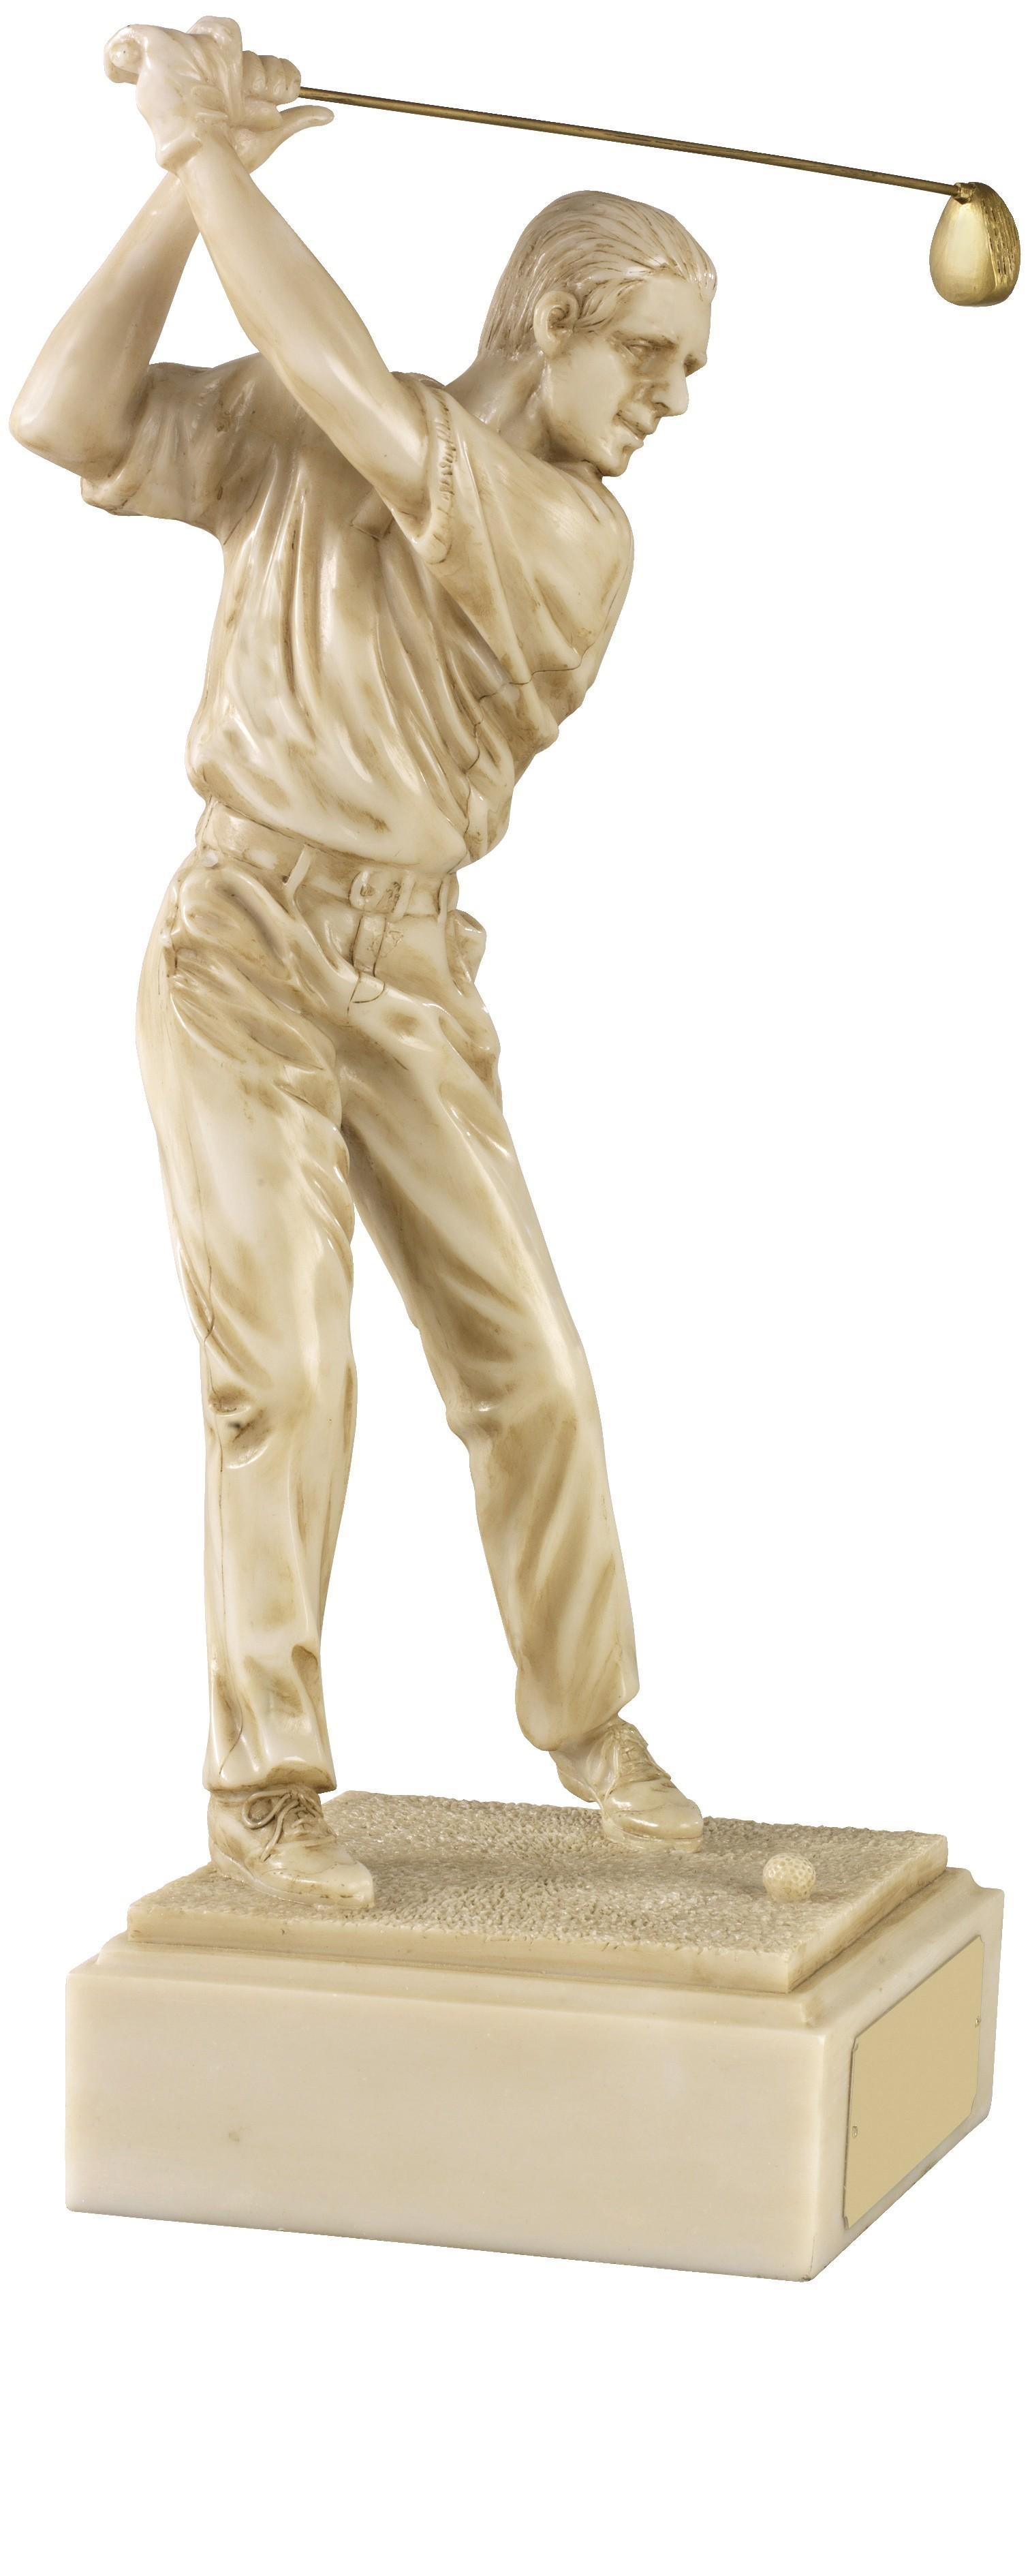 Male Golf Swing Lush Ivory Finish